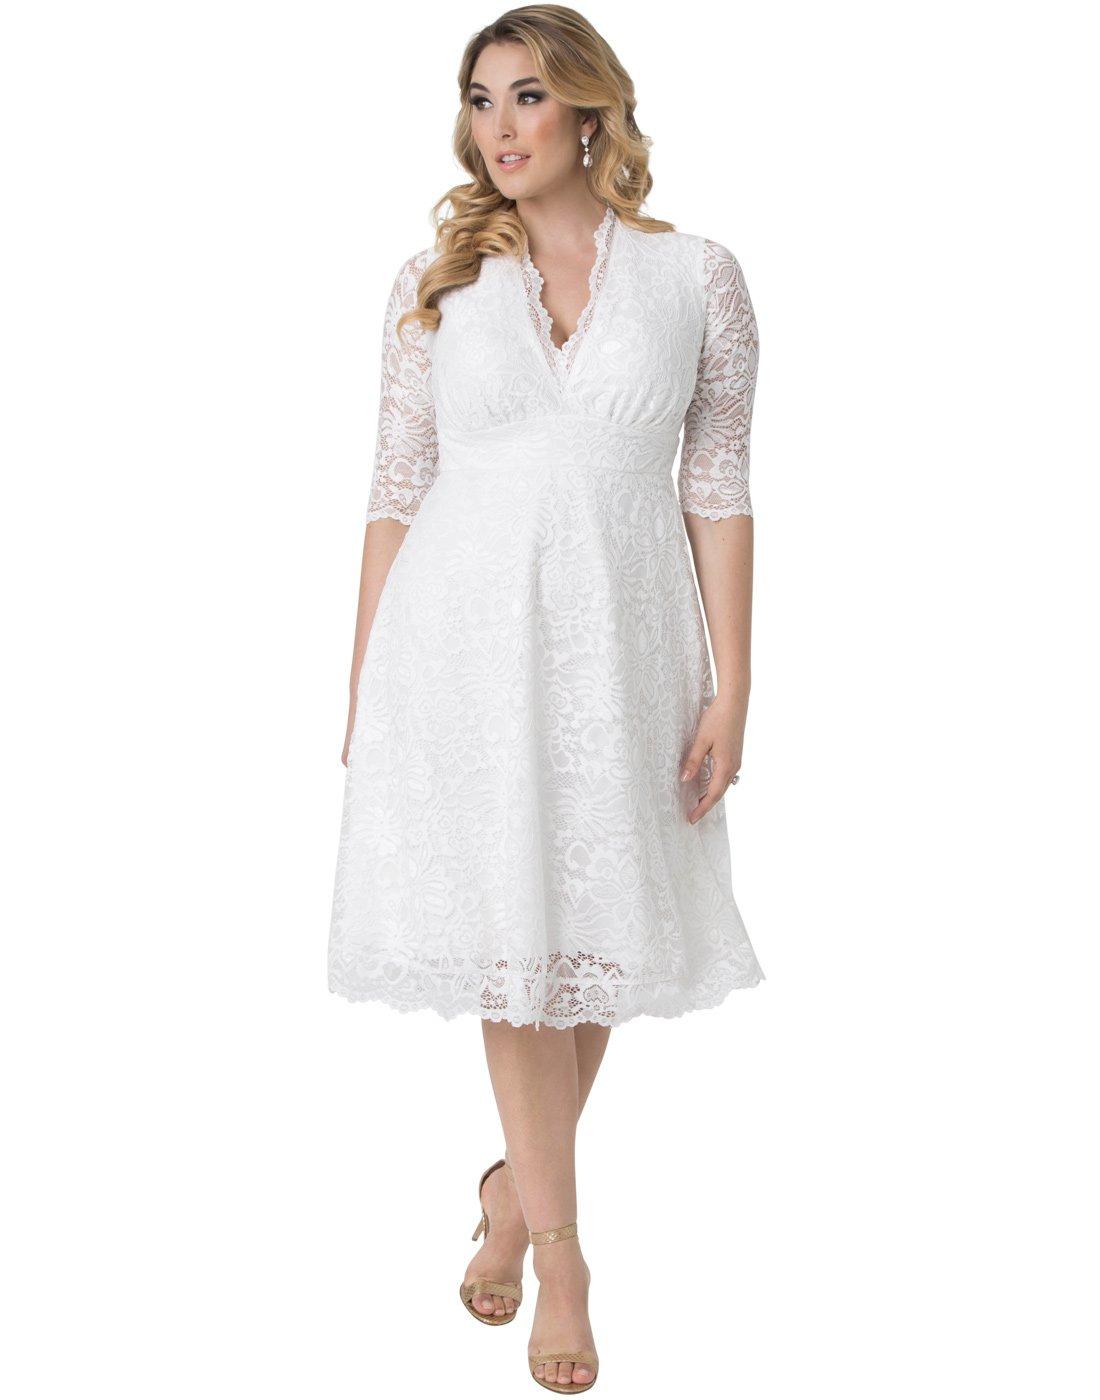 Kiyonna Women's Plus Size Wedding Belle Dress 0X Ivory